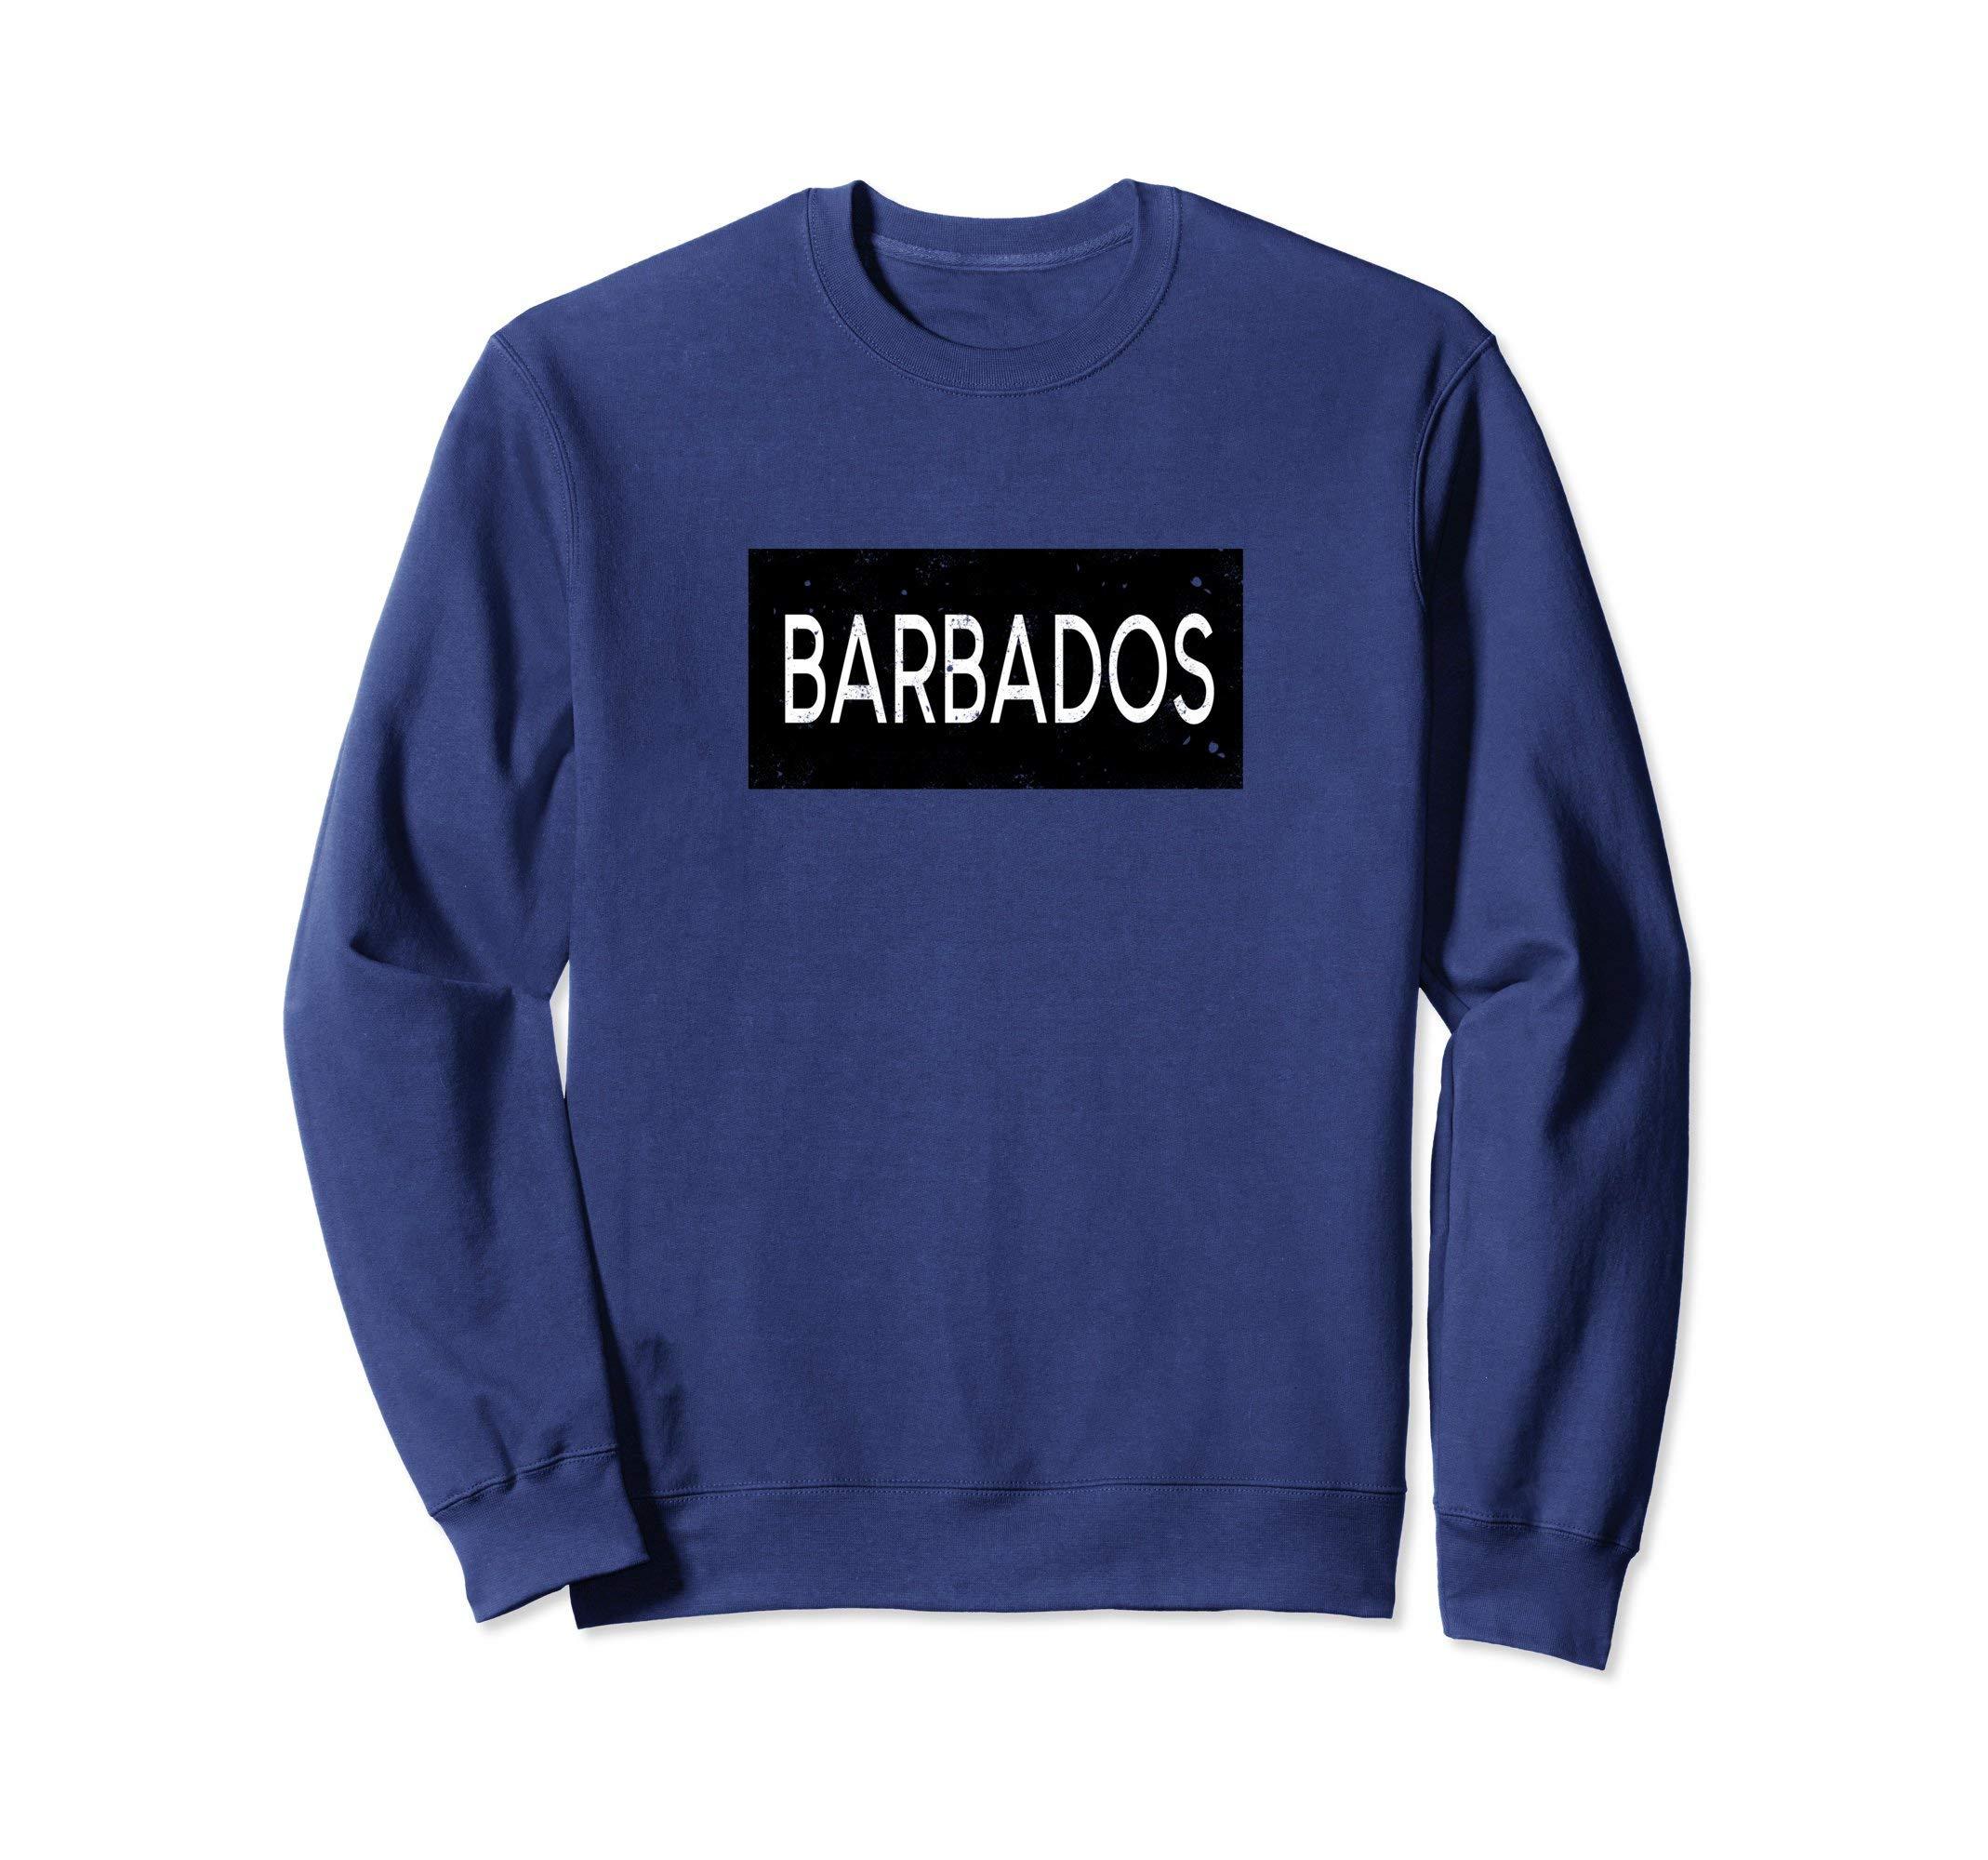 Barbados Sweatshirt Barbadian Bajan Travel Souvenirs Gift